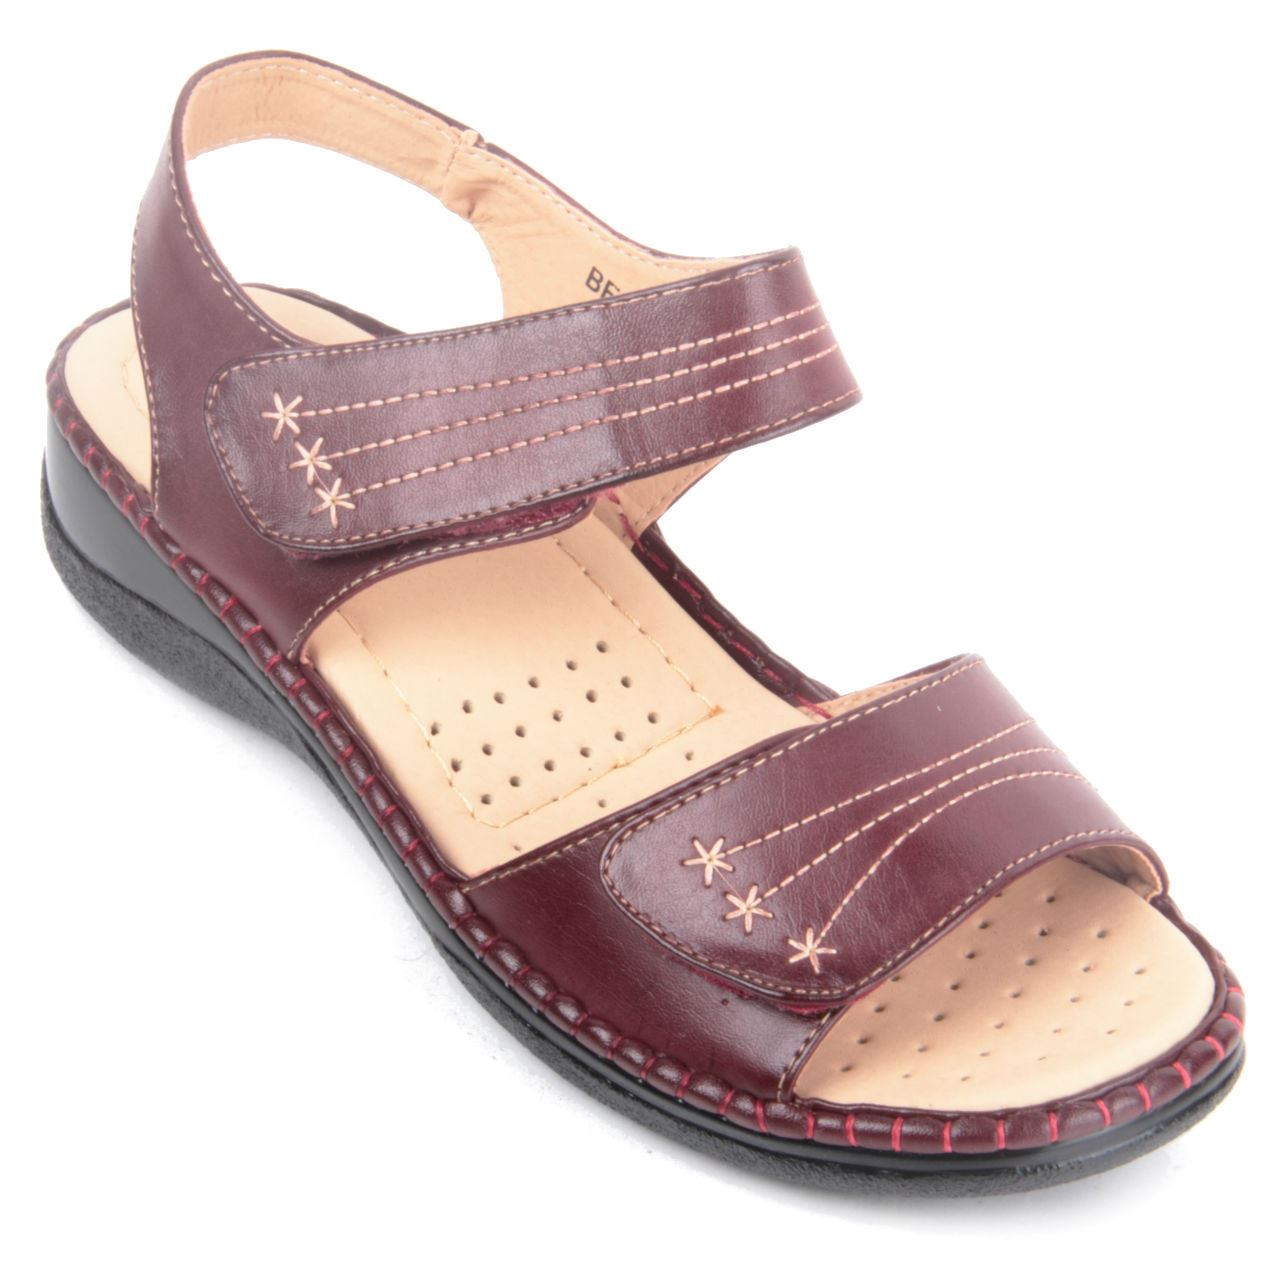 Popular Ecco Womens Velcro Strap Sandals Shadow White | McElhinneys